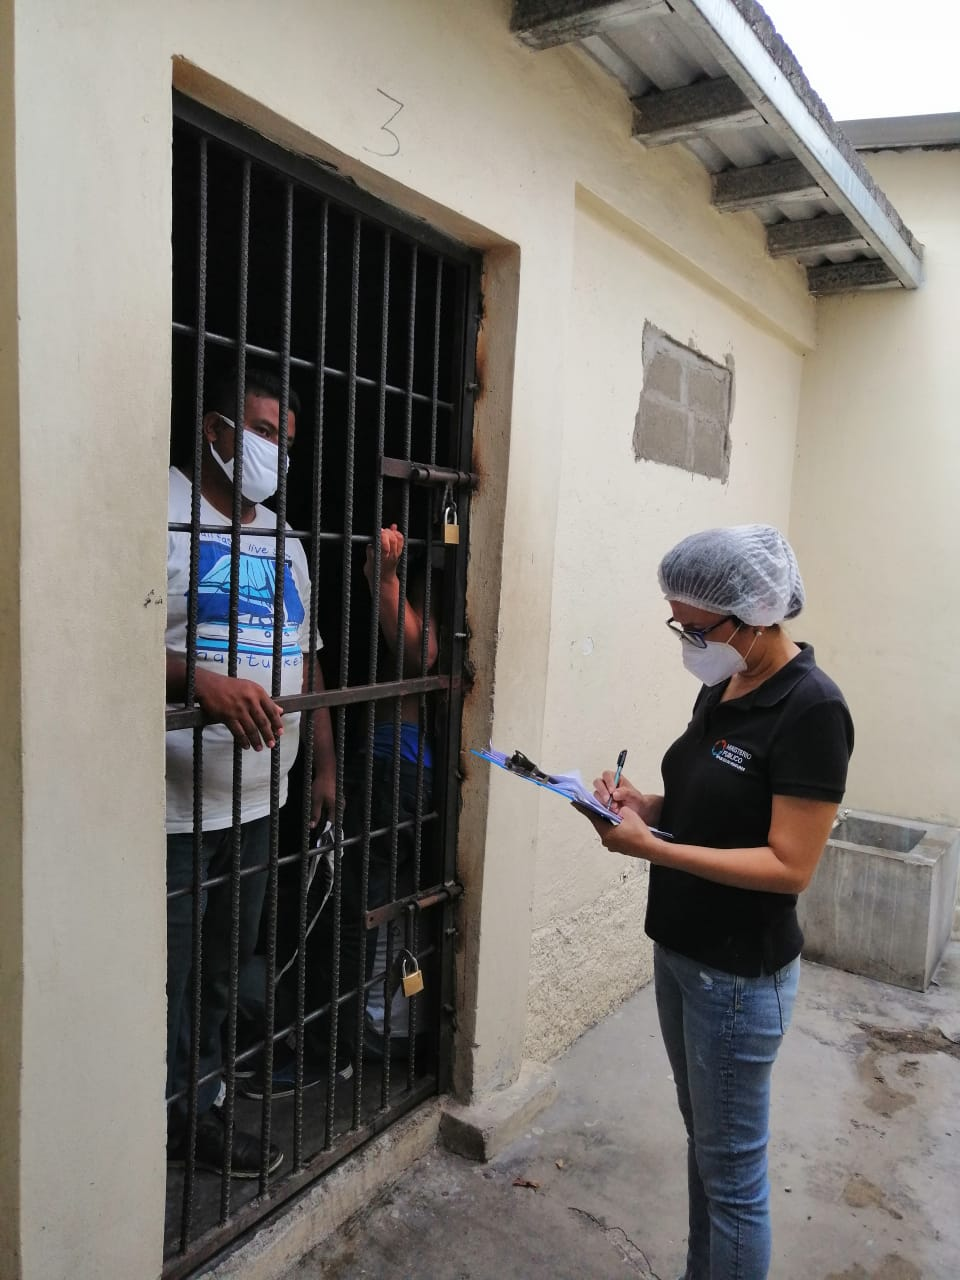 CASO GOLPIZA DE POLICIA A TRANSPORTITAS SPS 2